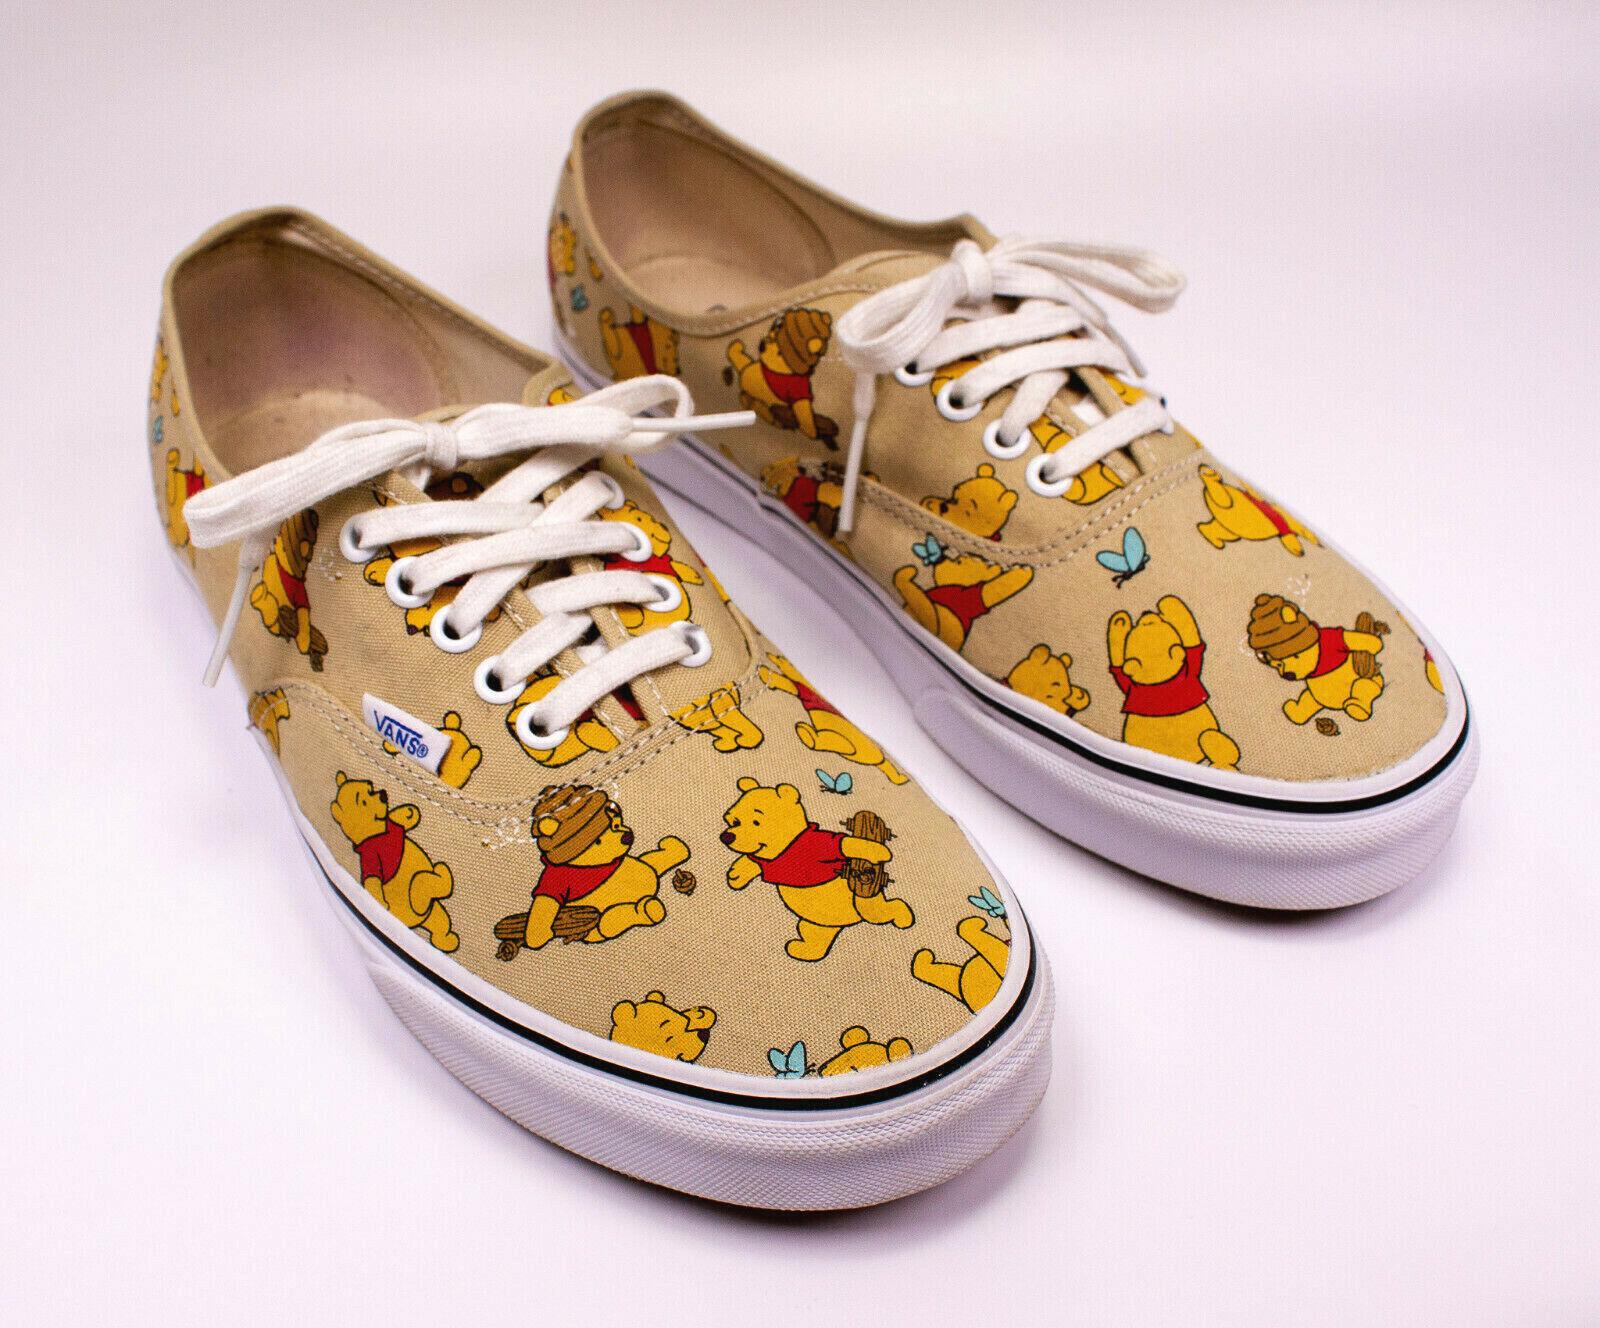 VANS Authentic Disney Winnie The Pooh